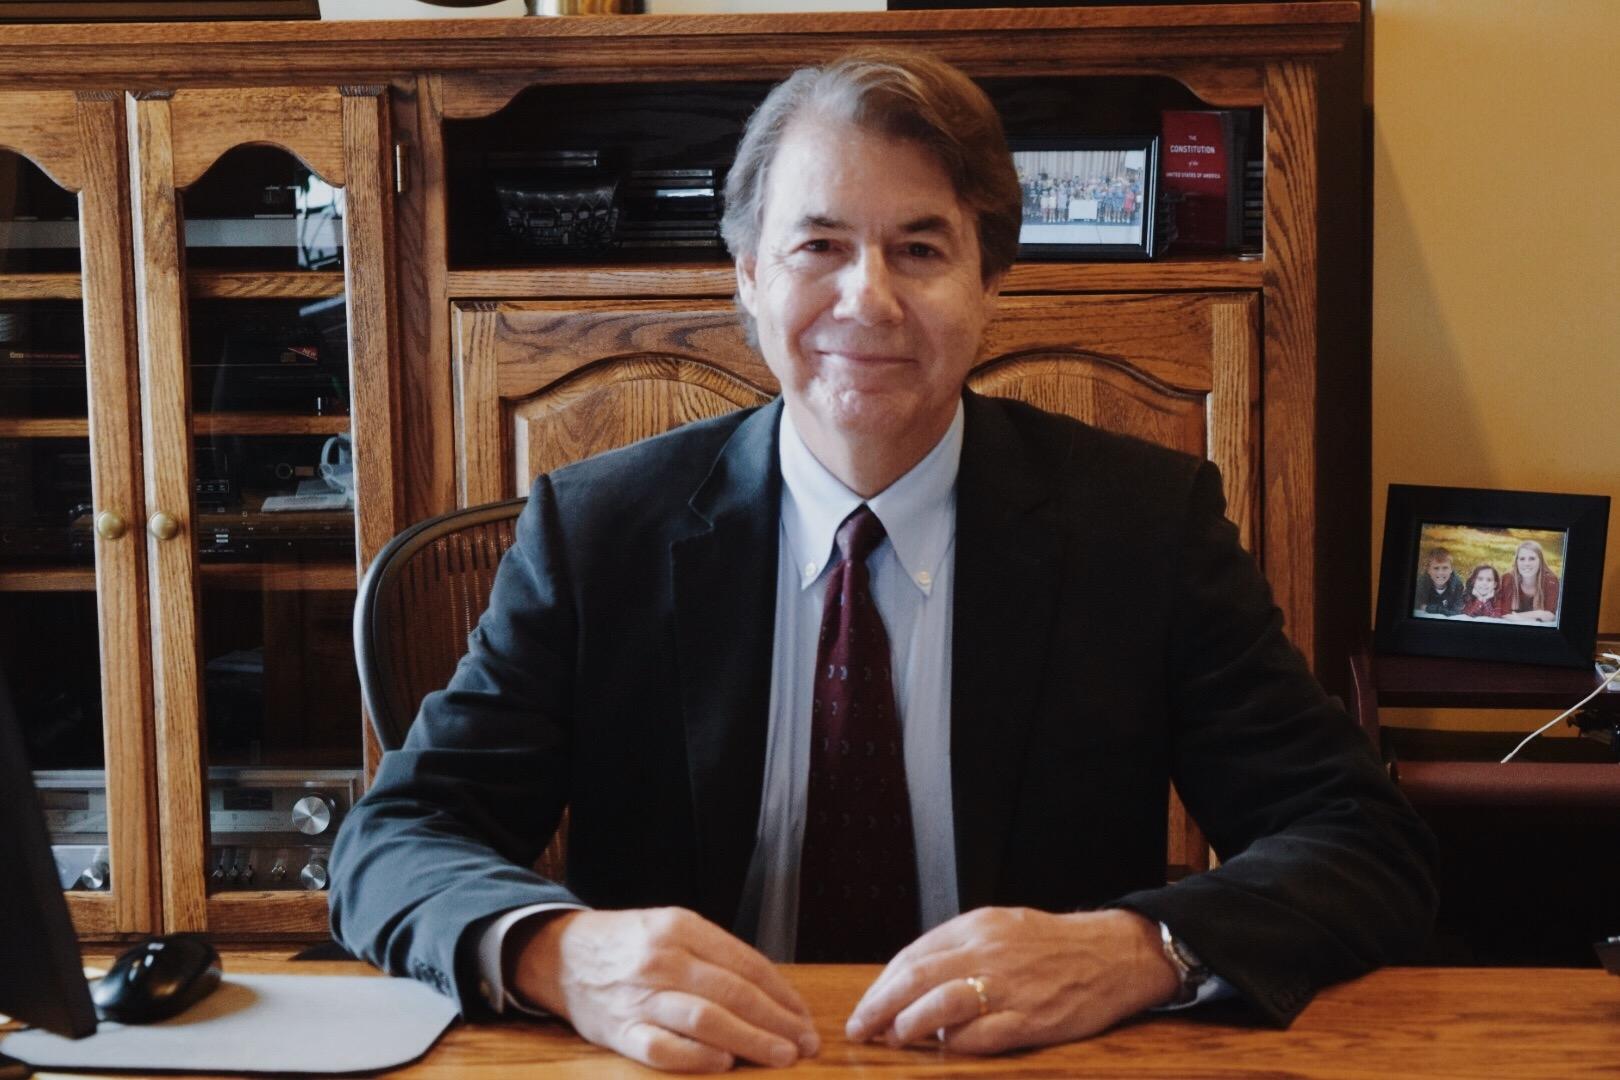 Brian Wojtalewicz, False Claims Act attorney